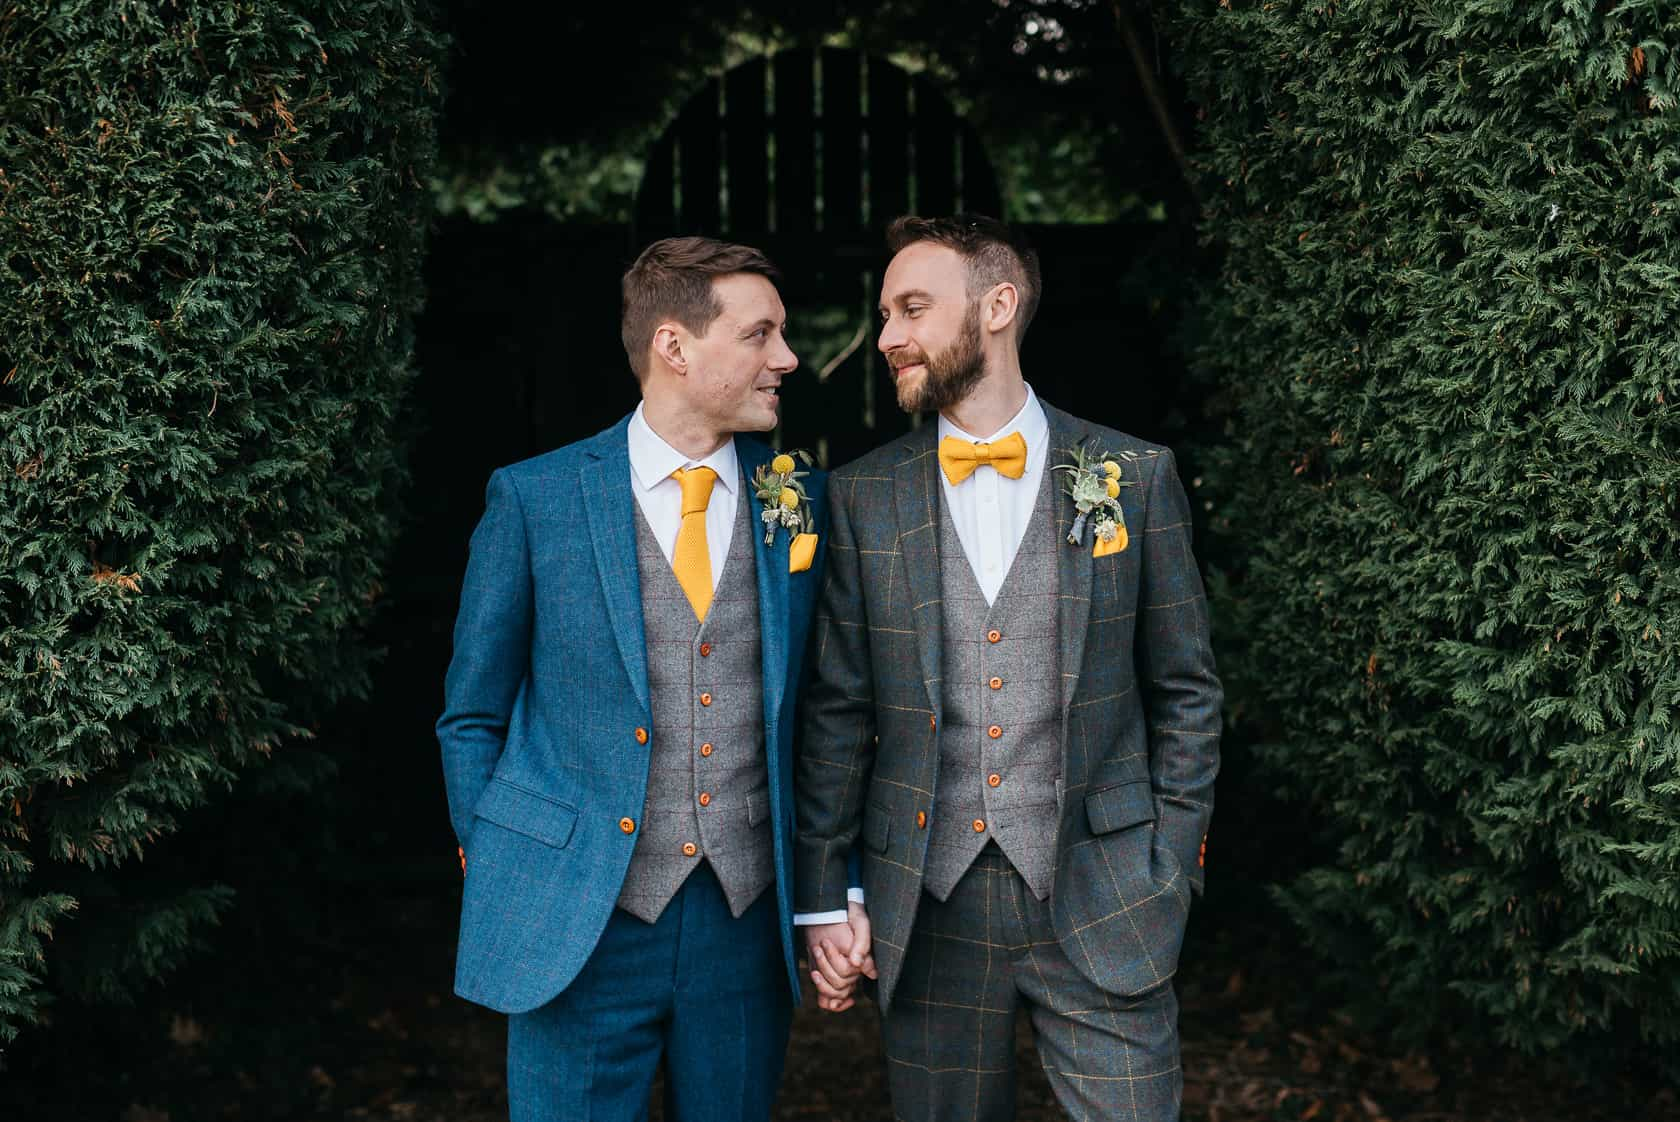 Best_Wedding_Photography_2019_Wedding-Photographer-Essex_015